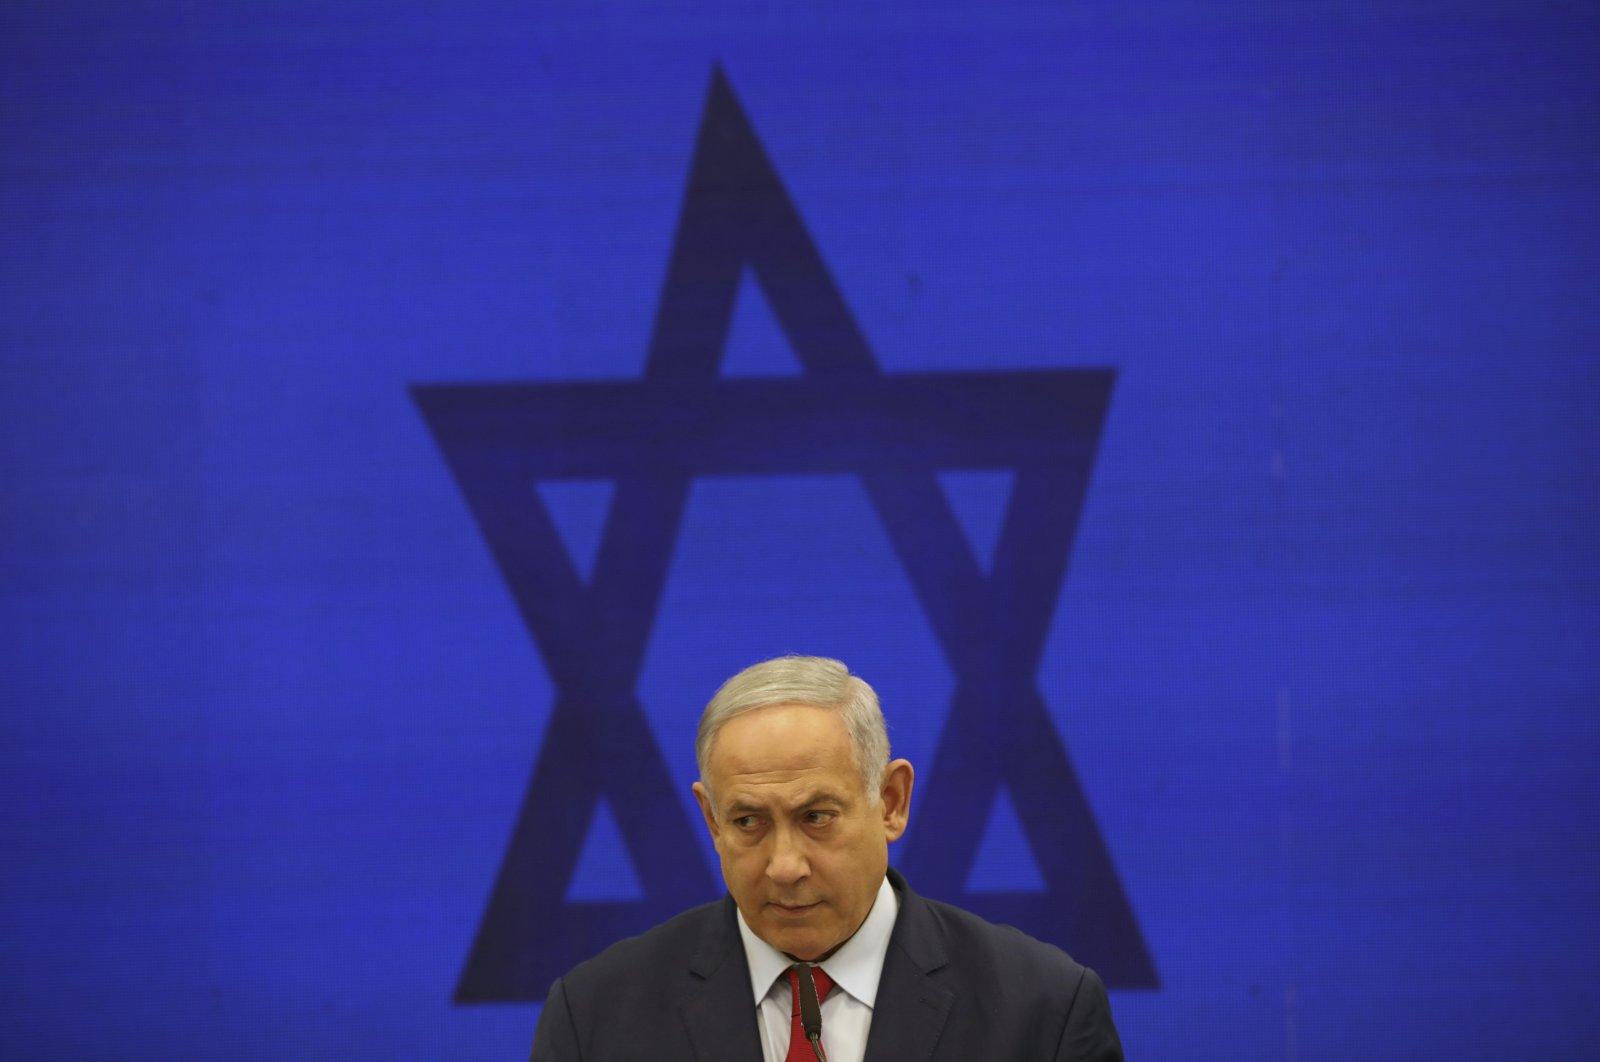 Israeli Prime Minister Benjamin Netanyahu speaks during a news conference, Tel Aviv, Israel, Sept. 10, 2019. (AP Photo)